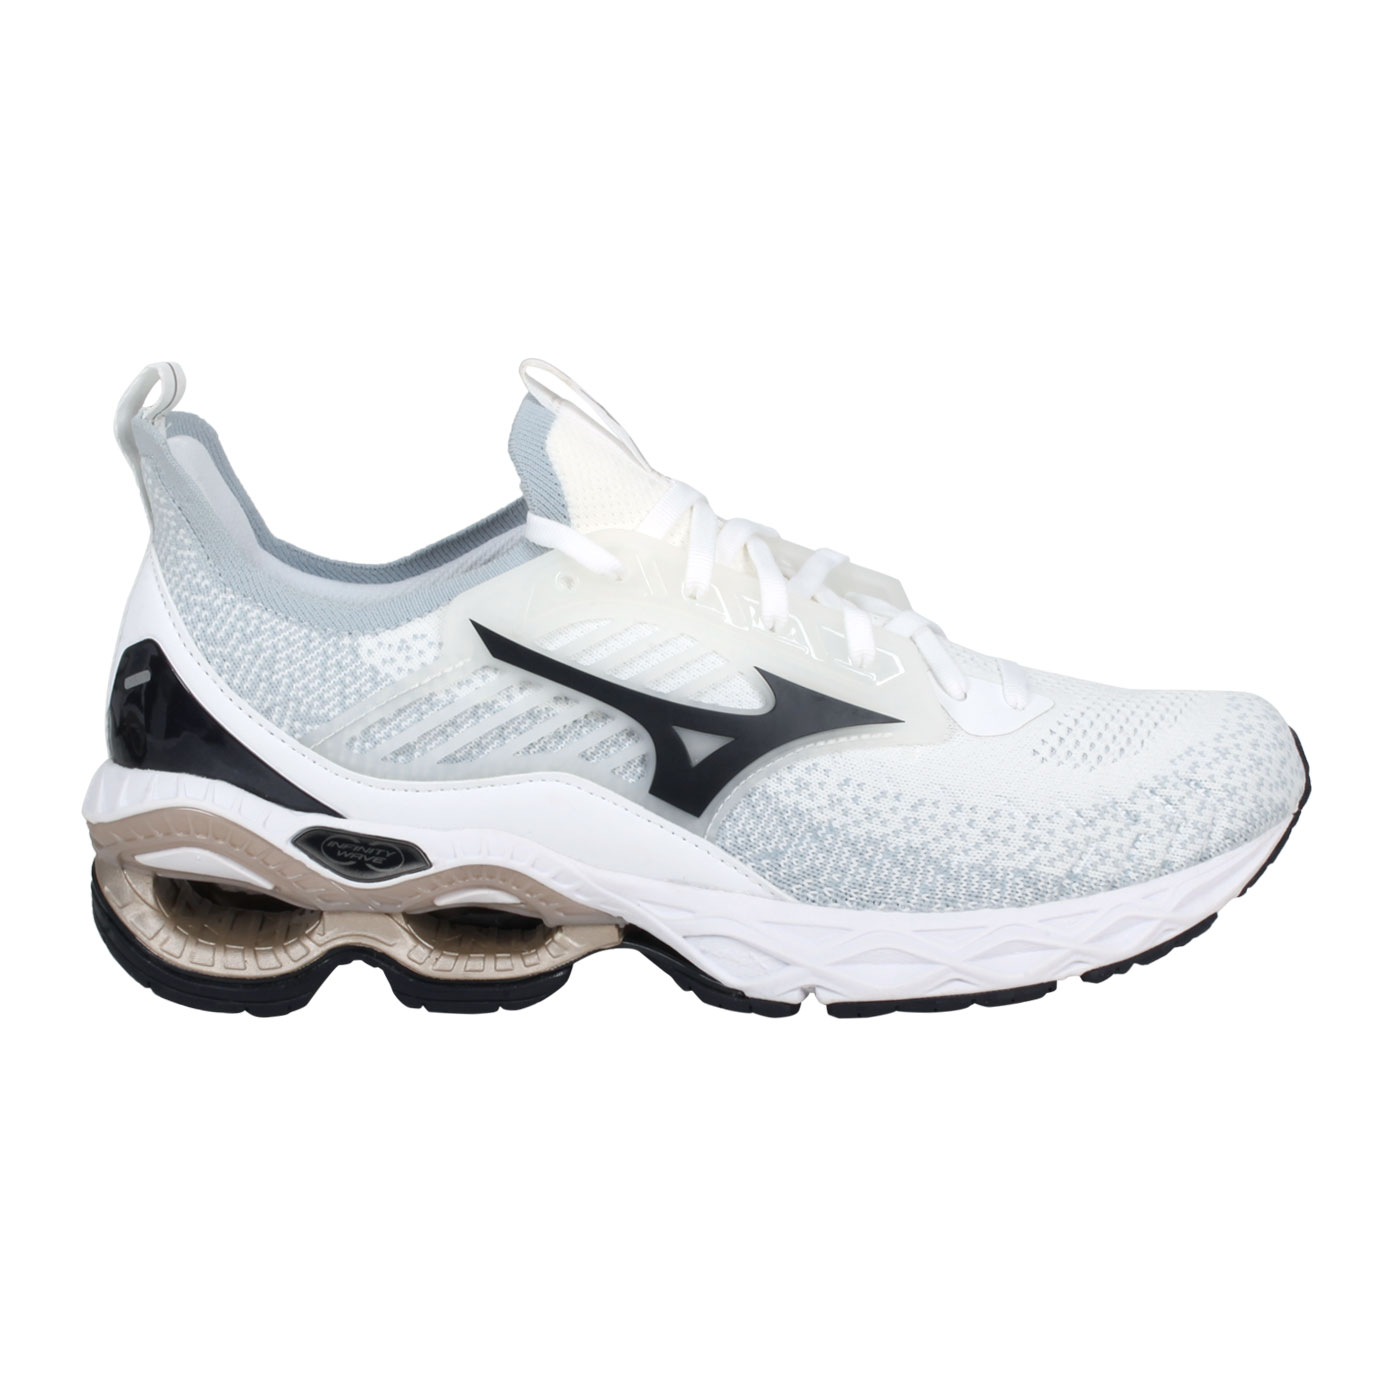 MIZUNO 男款慢跑鞋  @WAVE CREATION 22 WAVEKNIT@J1GC213390